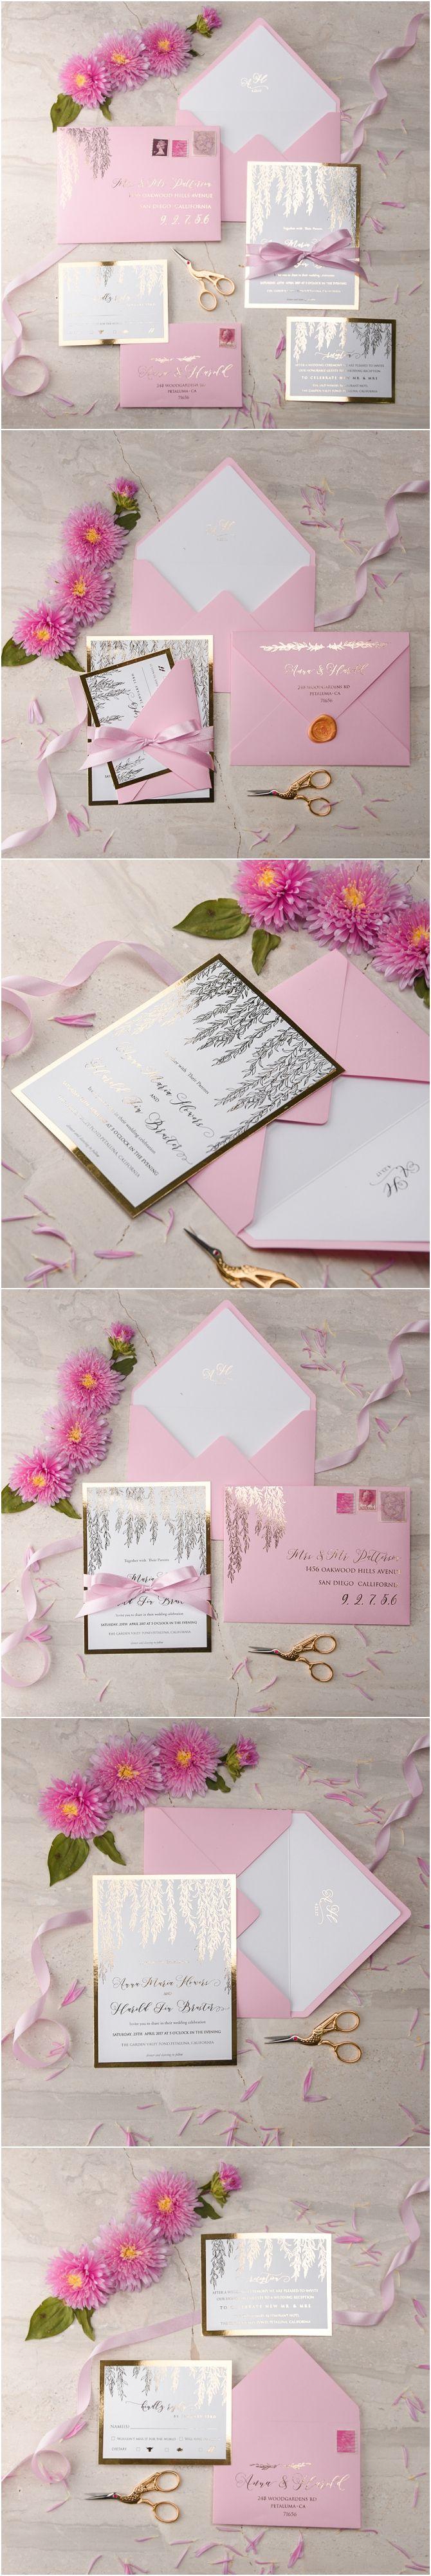 Pink & Gold Wedding Invitations - gold foil printing, ribbon and wax stamp #weddinginvitations #unique #romantic #elegant #weddingideas #gold #pink #blush #glam